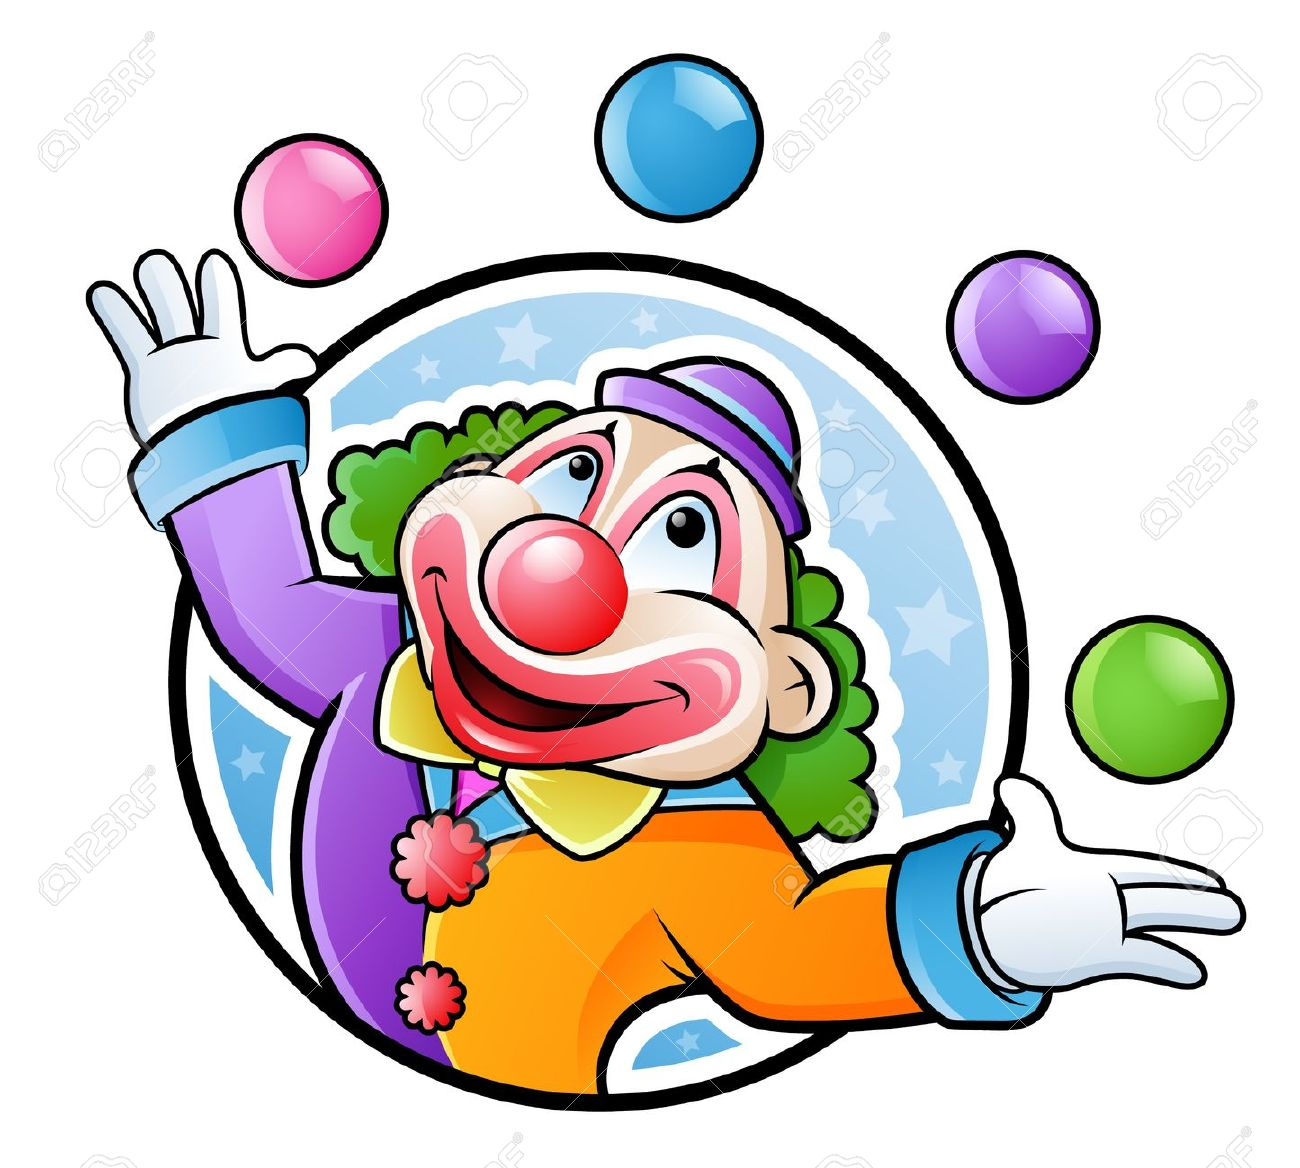 1300x1168 Joker Clipart Juggler